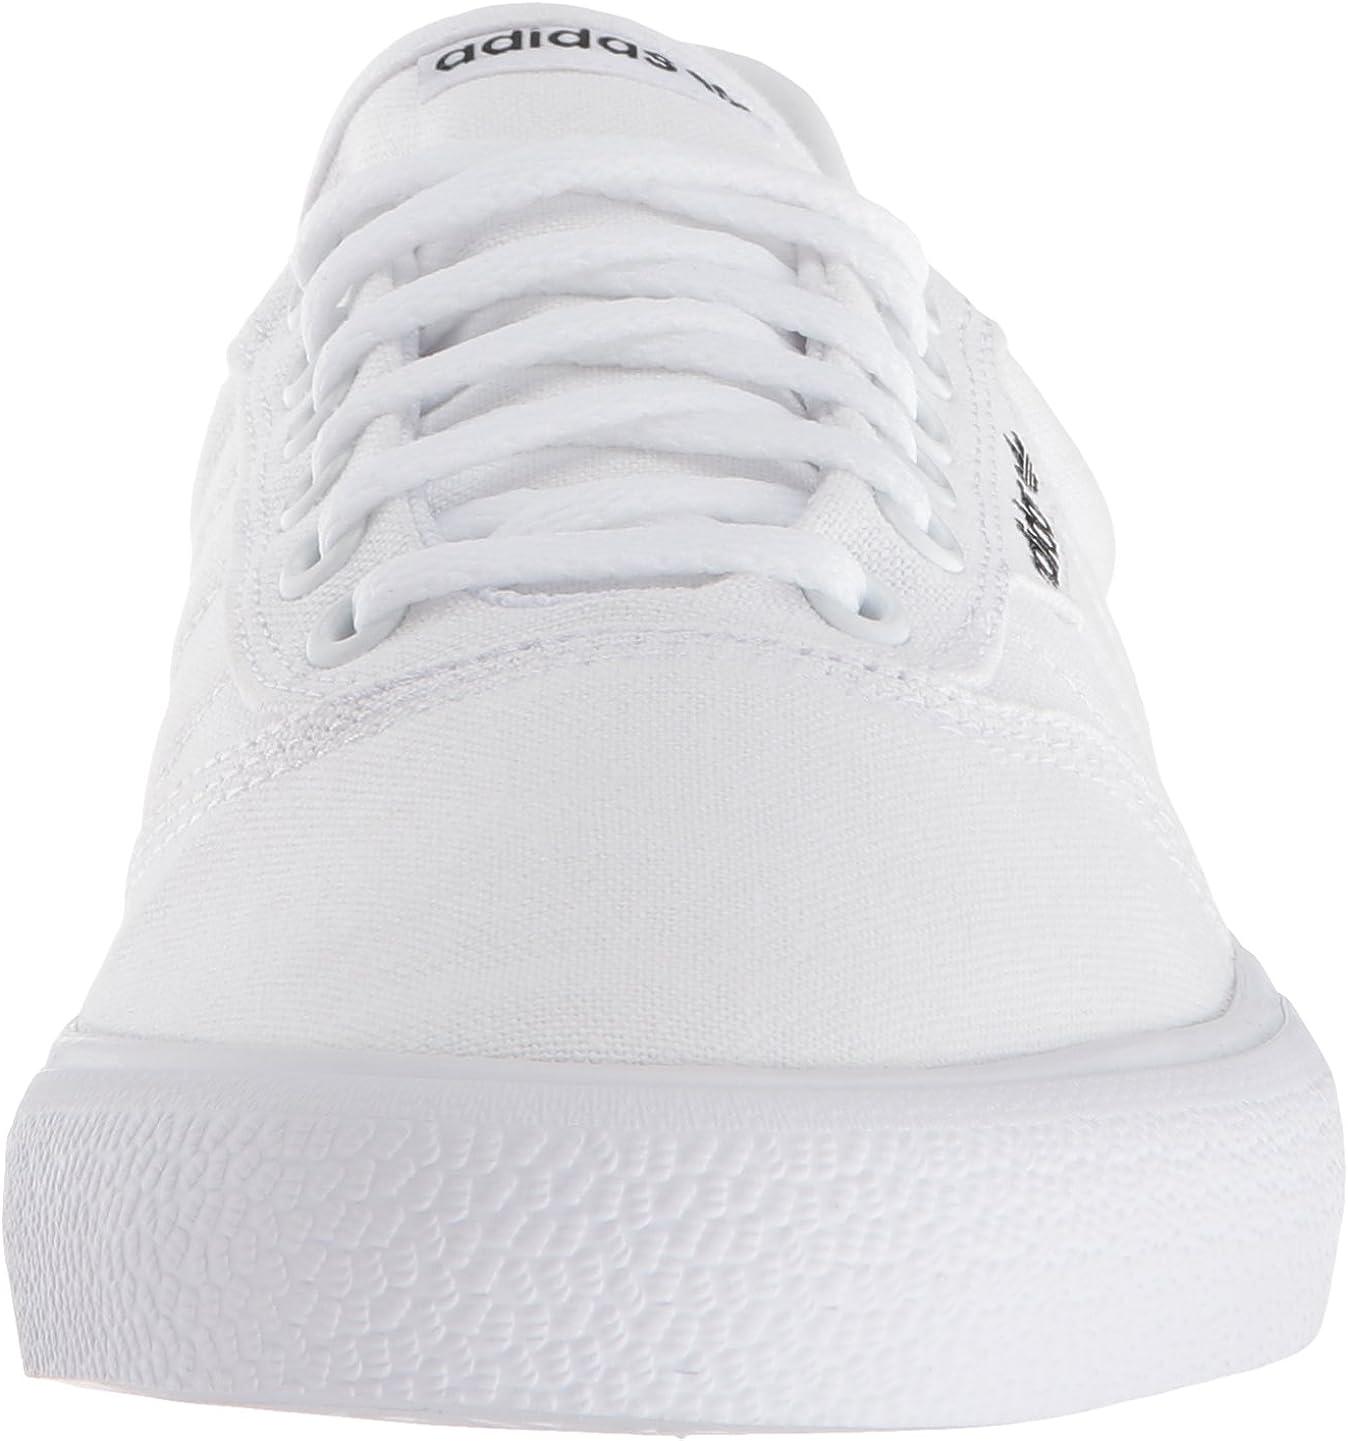 adidas Originals 3mc, Tennis Mixte Adulte Blanc Or Métallique